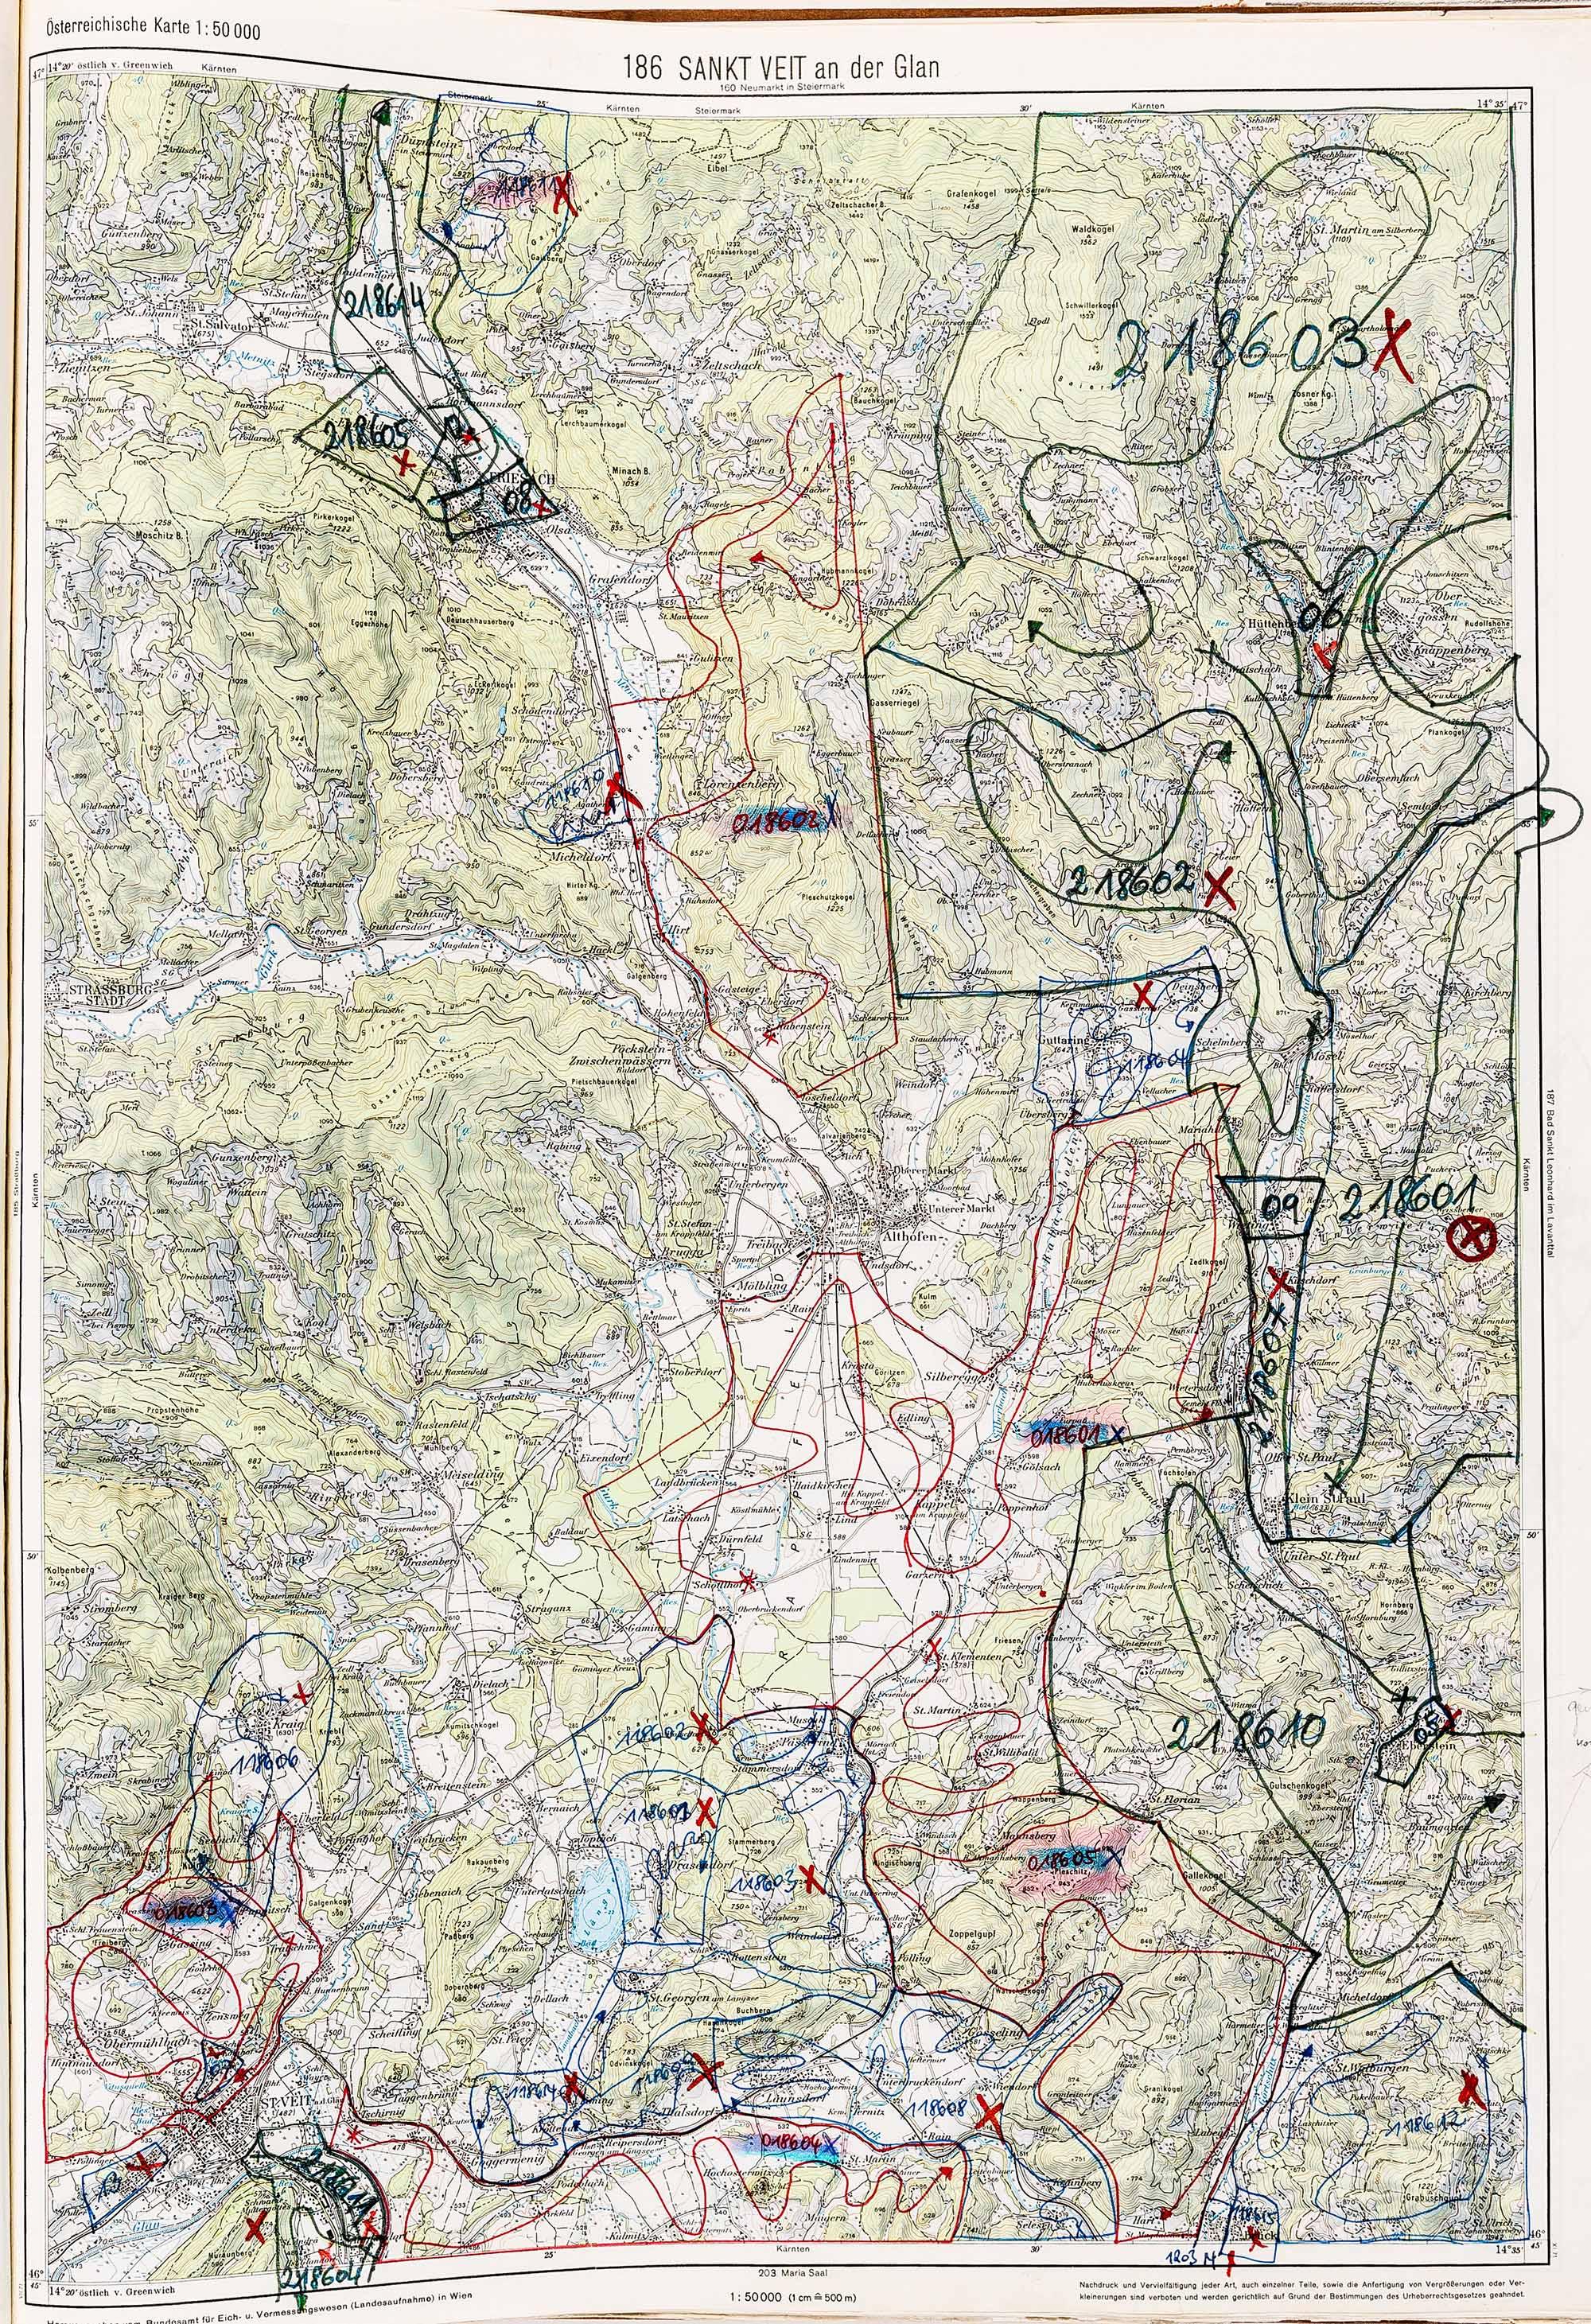 1979-1982 Karte 186